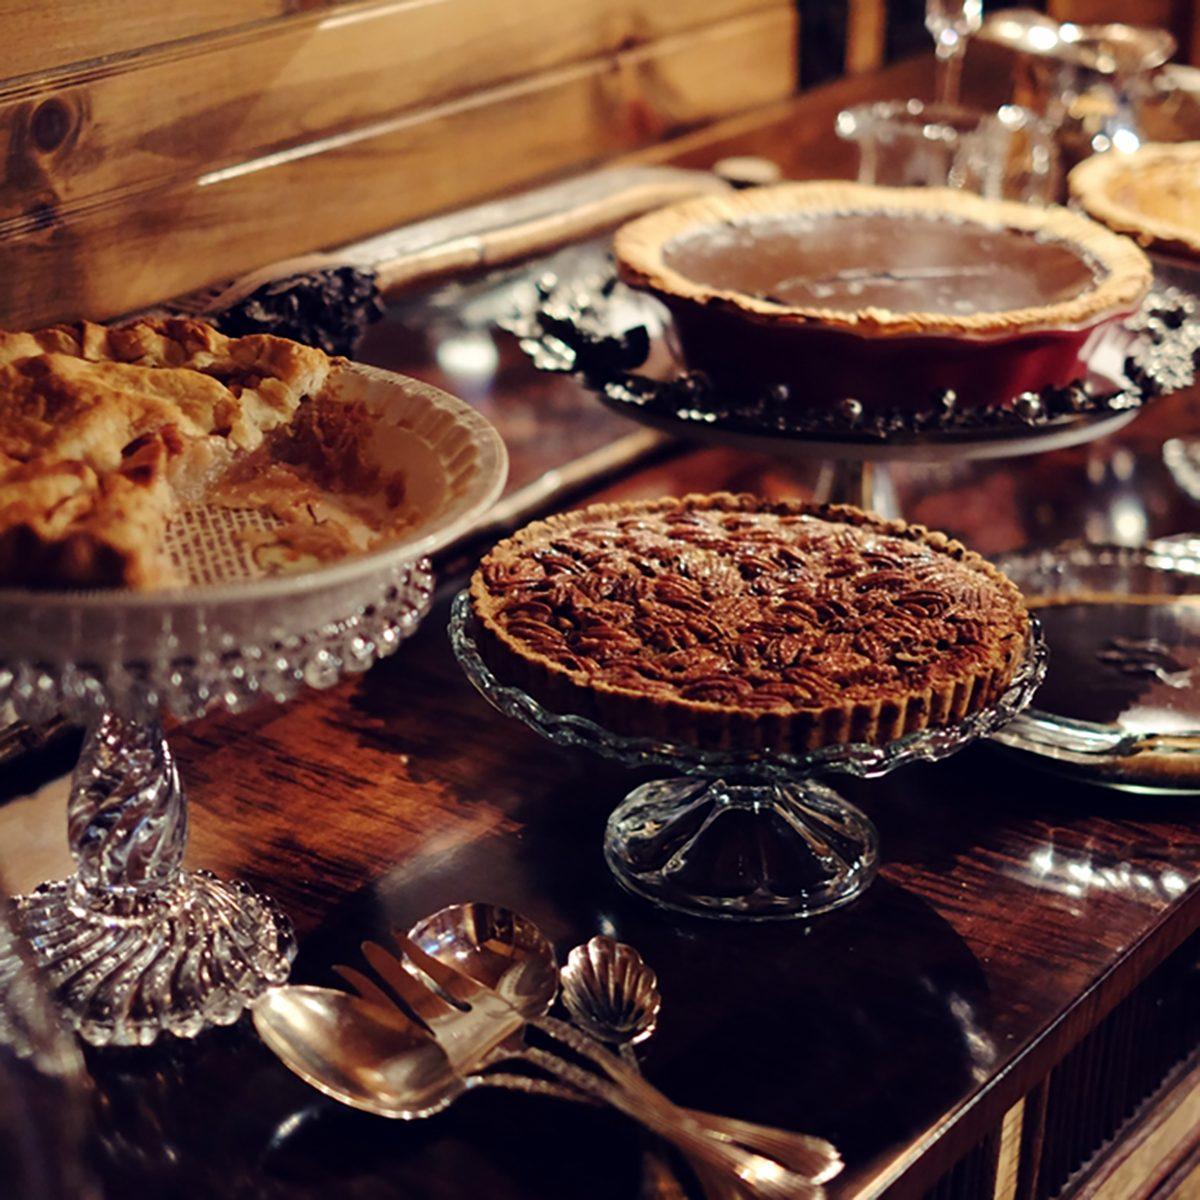 Thanksgiving home made pie assortment